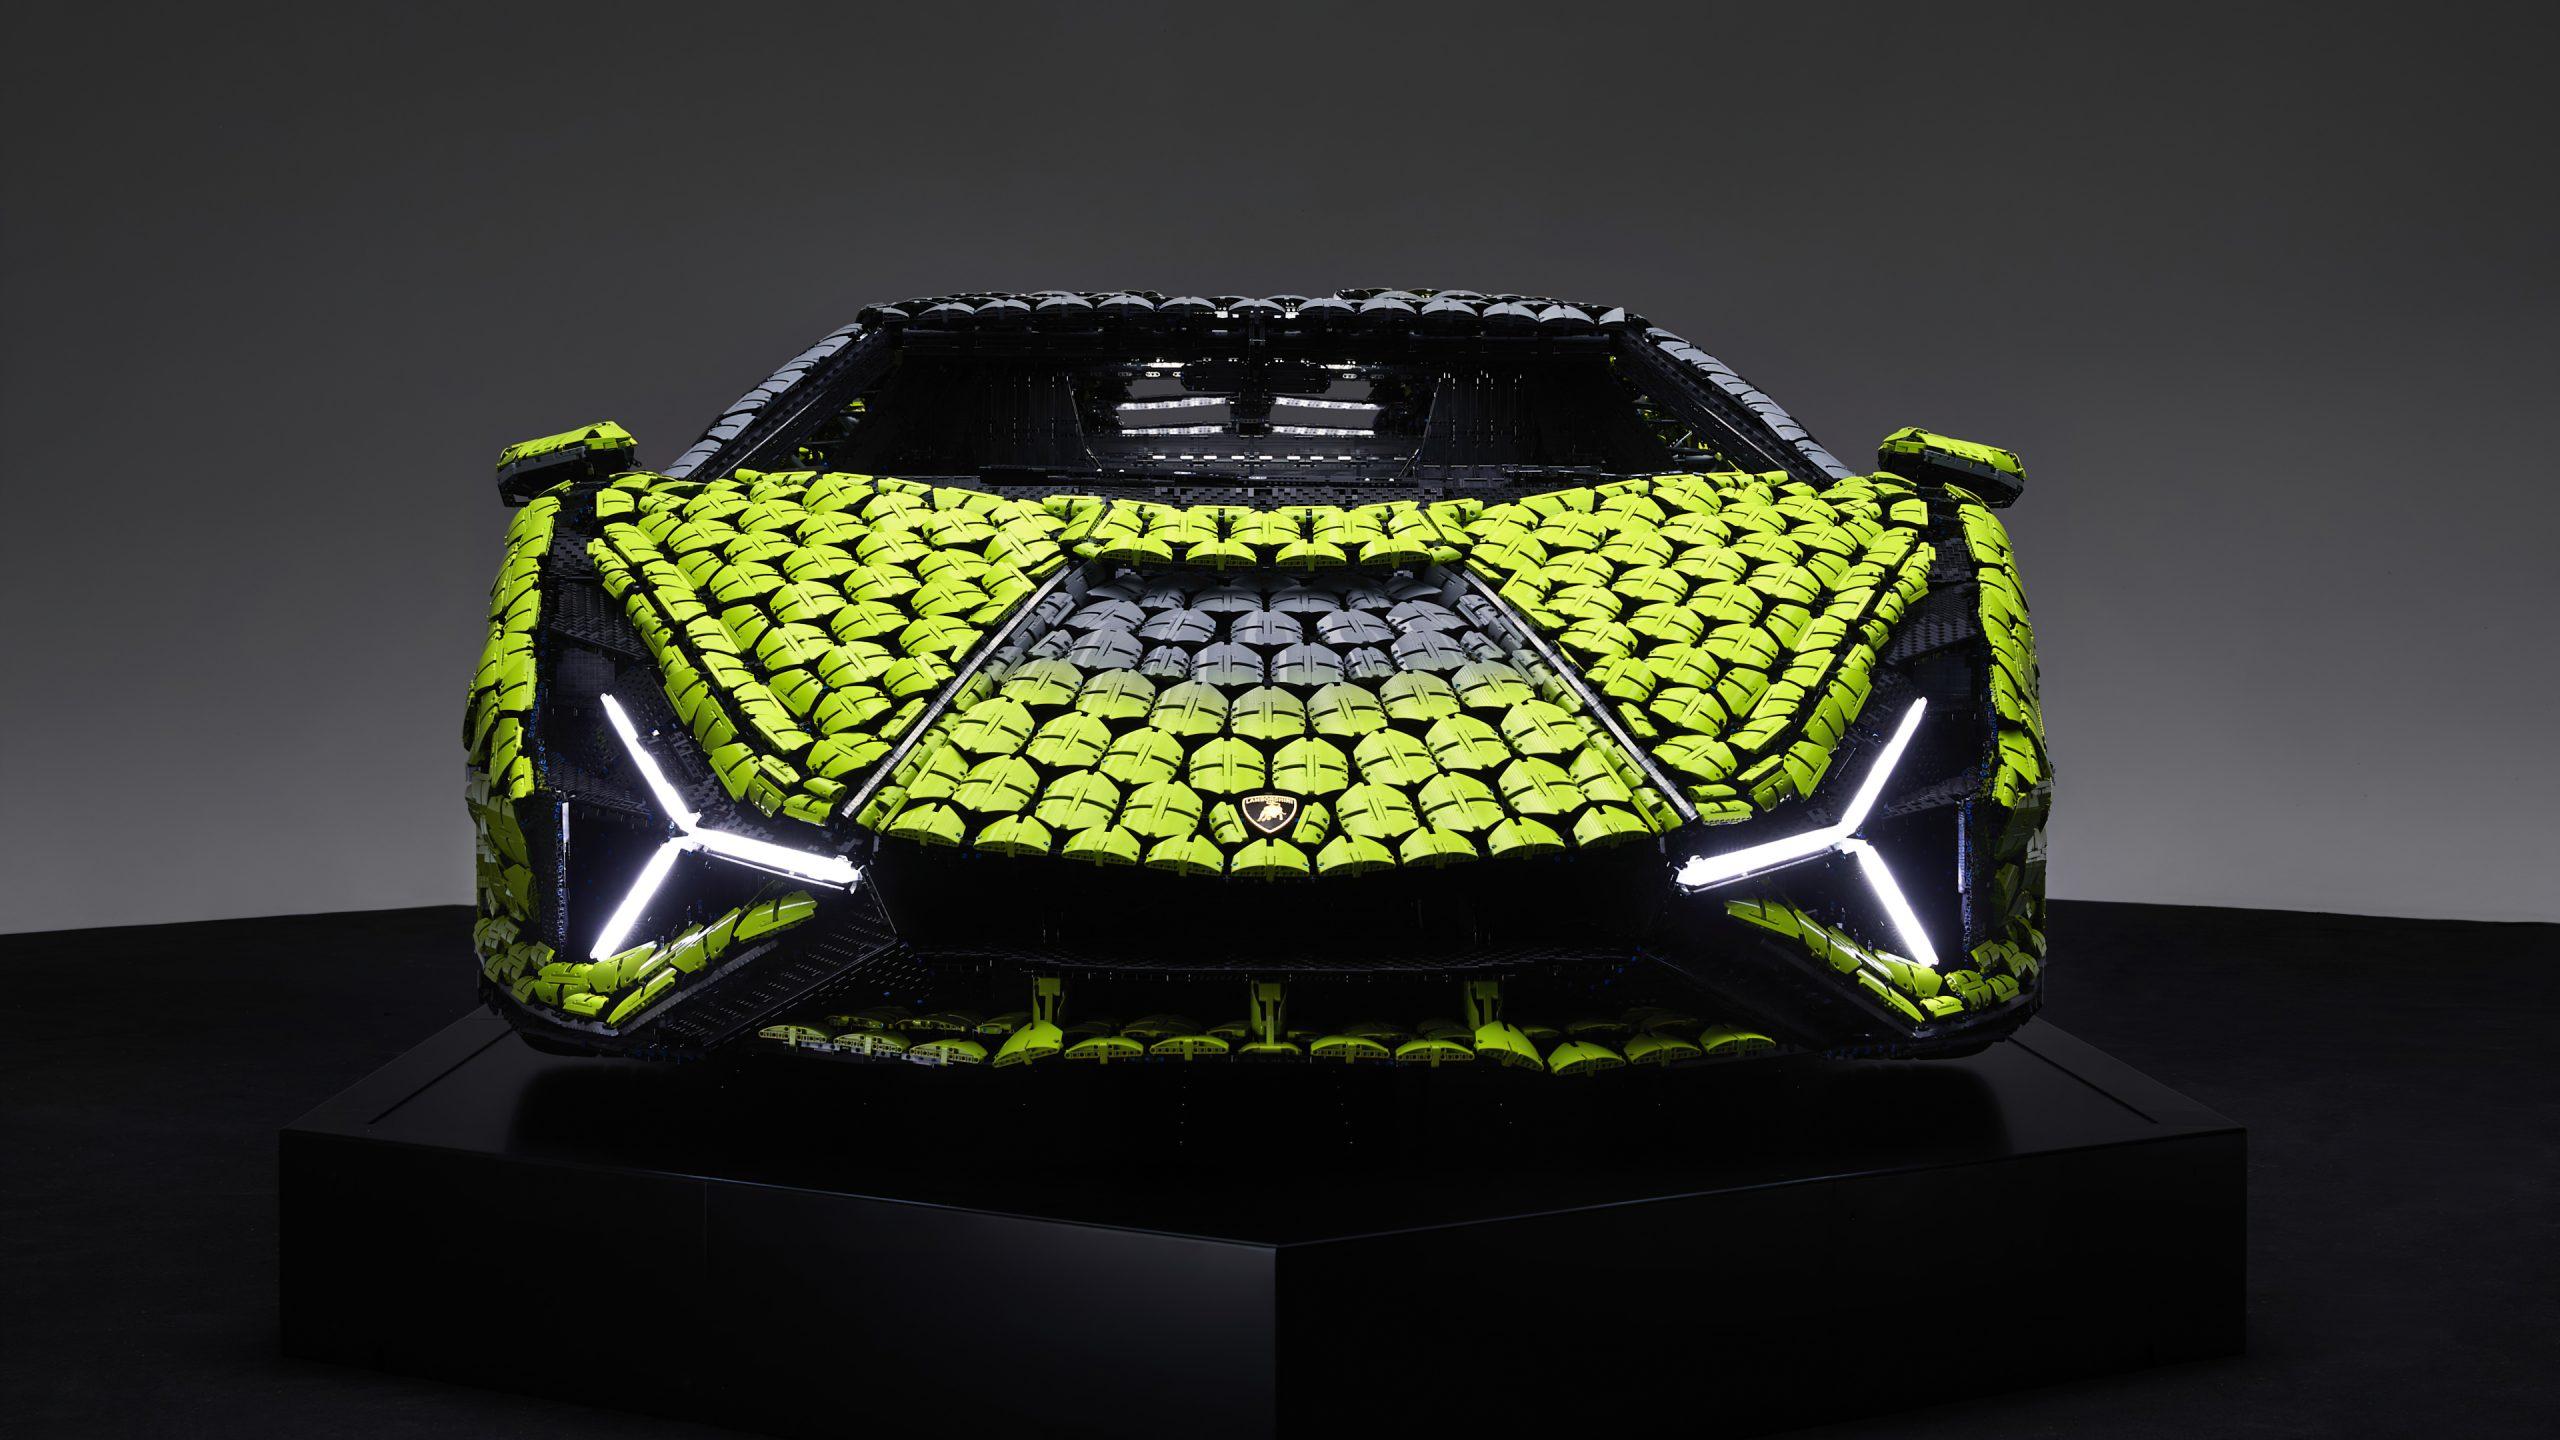 LEGO Technic Lamborghini Sian FKP 37